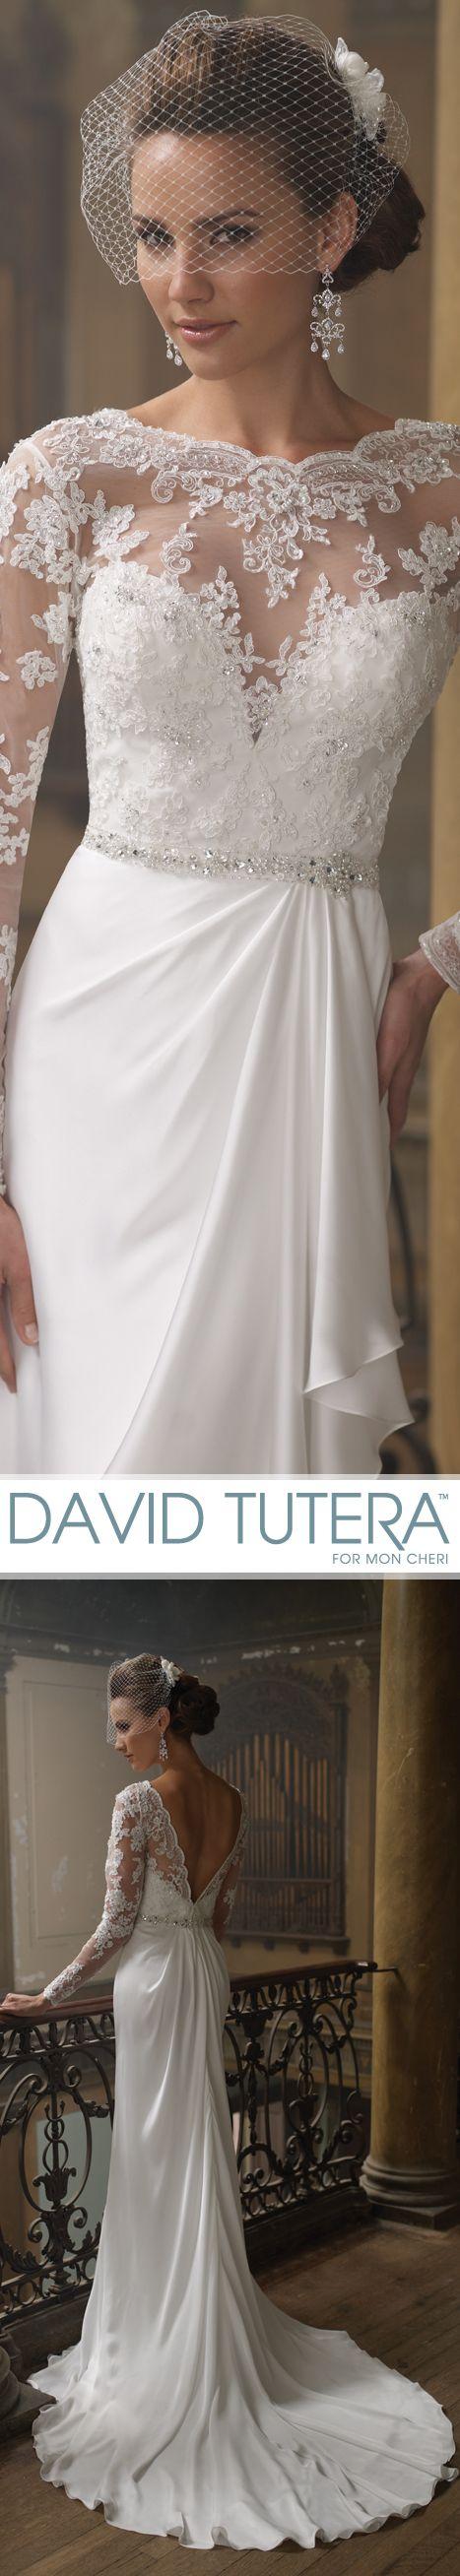 25 Best Ideas About Dresses 2013 On Pinterest Davids